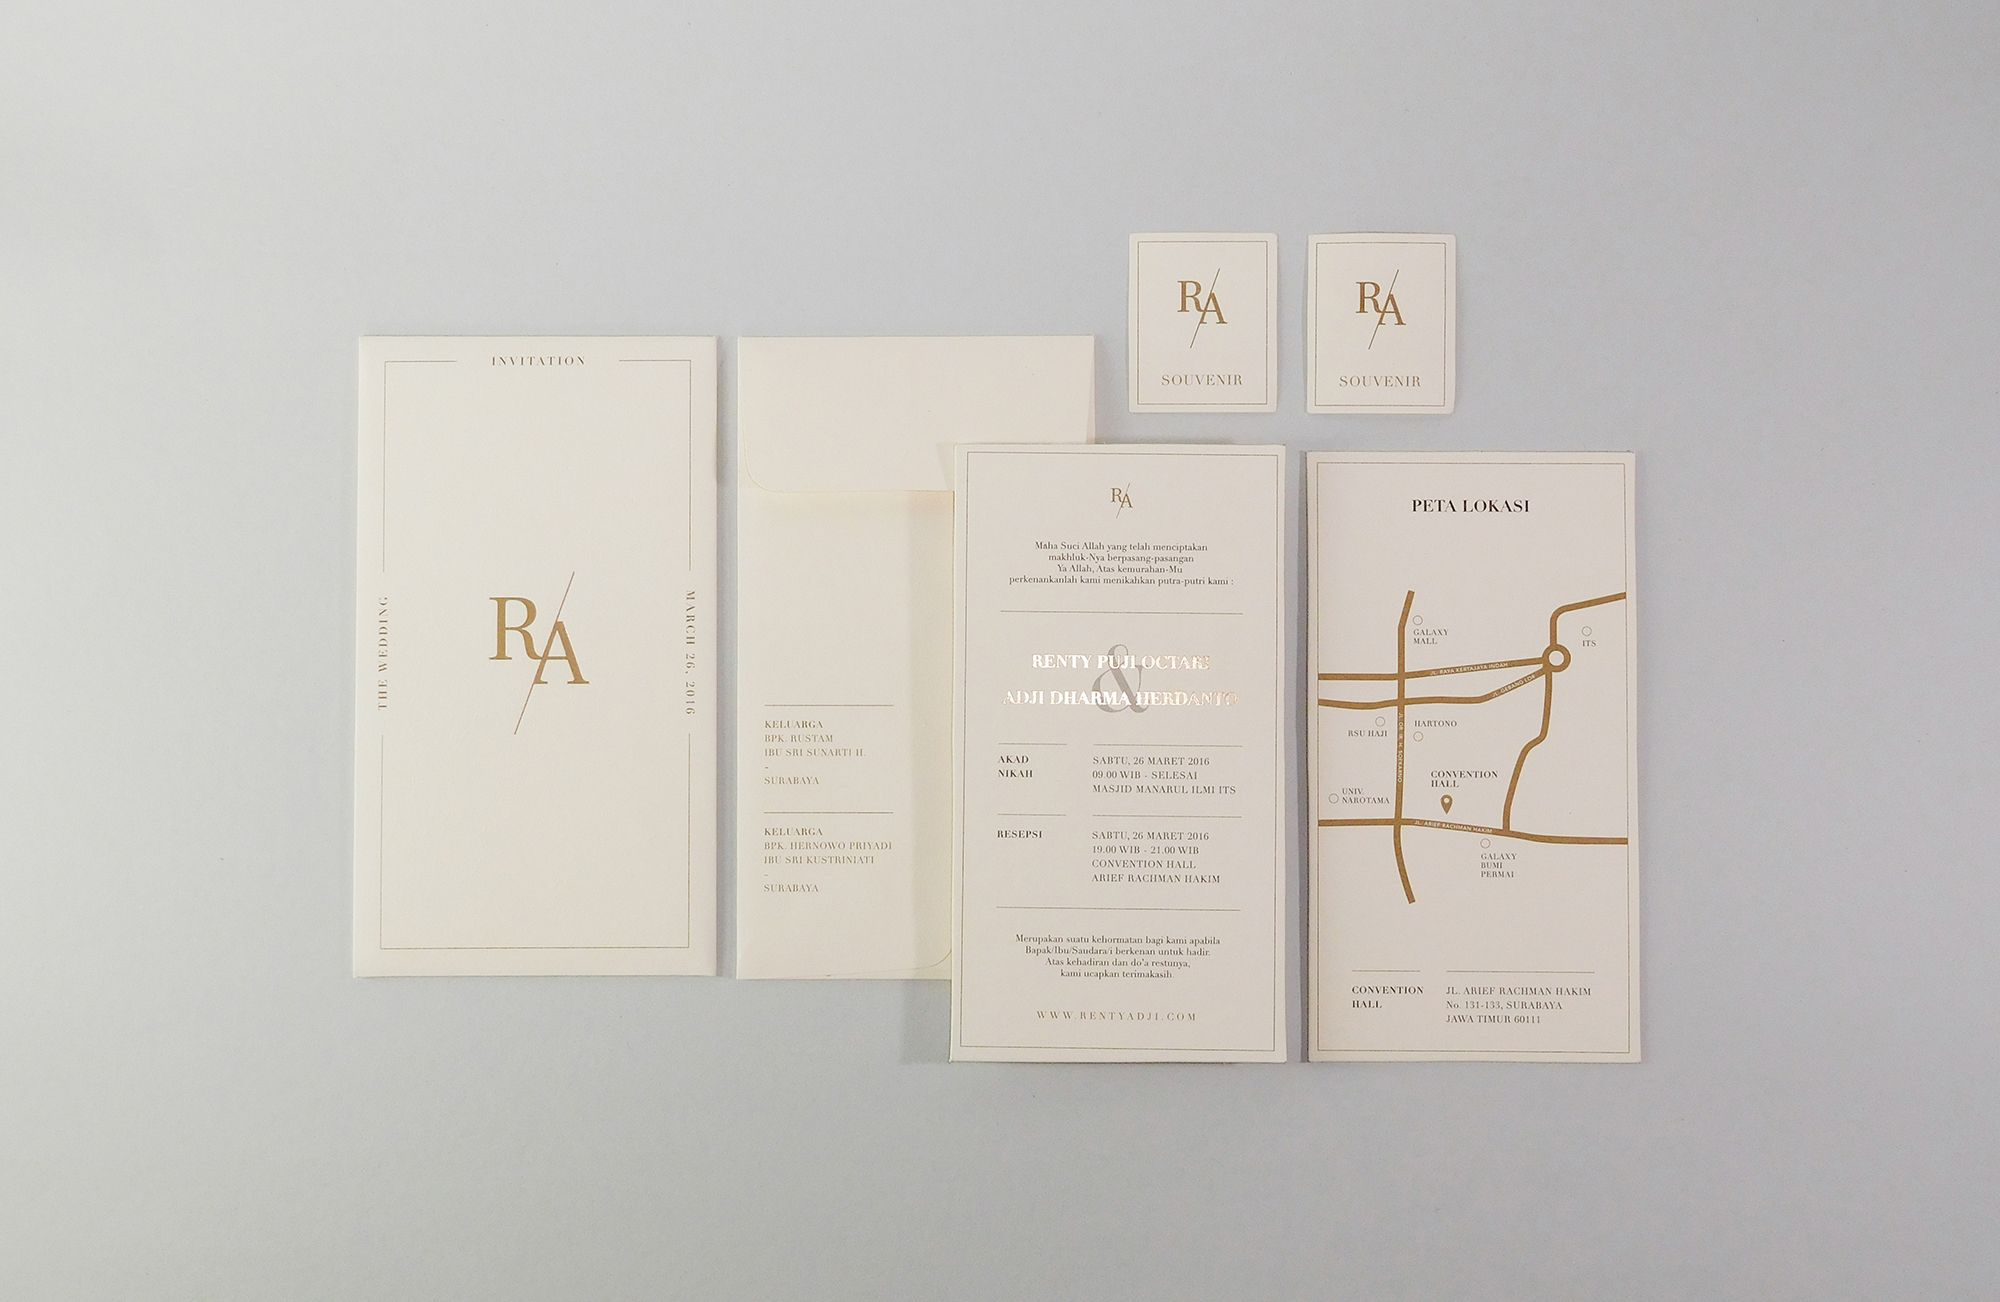 March 26 A minimalist design for